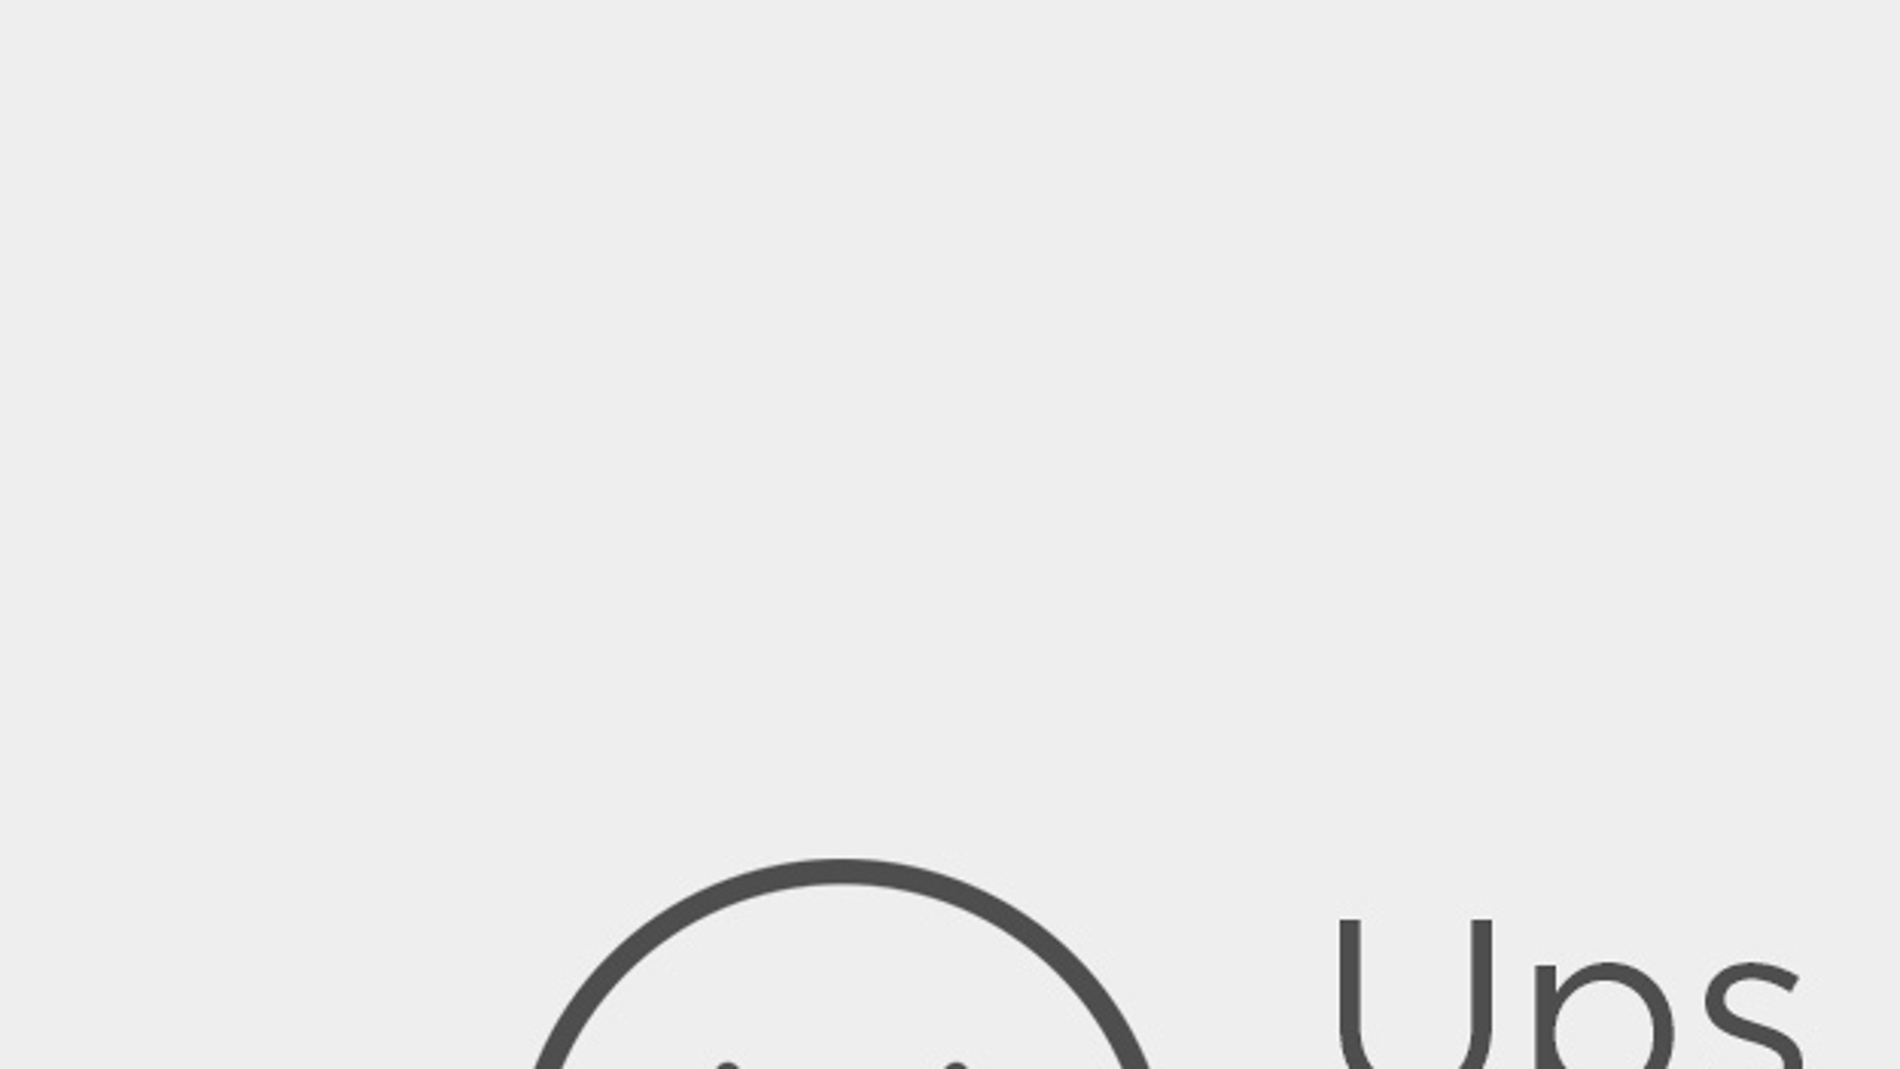 La tumba de Apocalypse en 'X-Men: Apocalipsis'